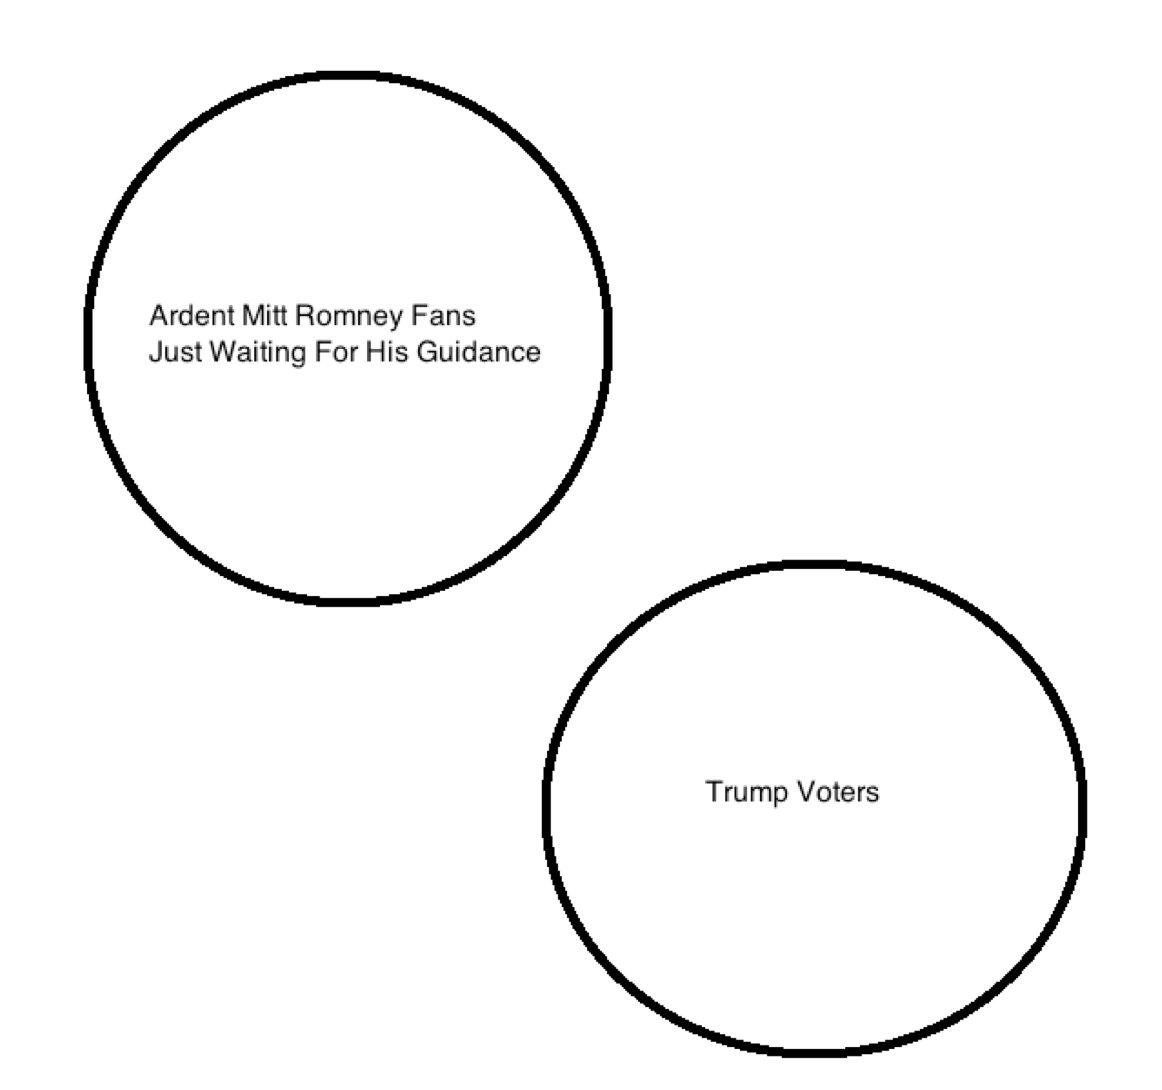 The problem with Romney's speech, in one Venn diagram: https://t.co/xOaOEc32jt via @petridishes https://t.co/mUNyuc1JVH